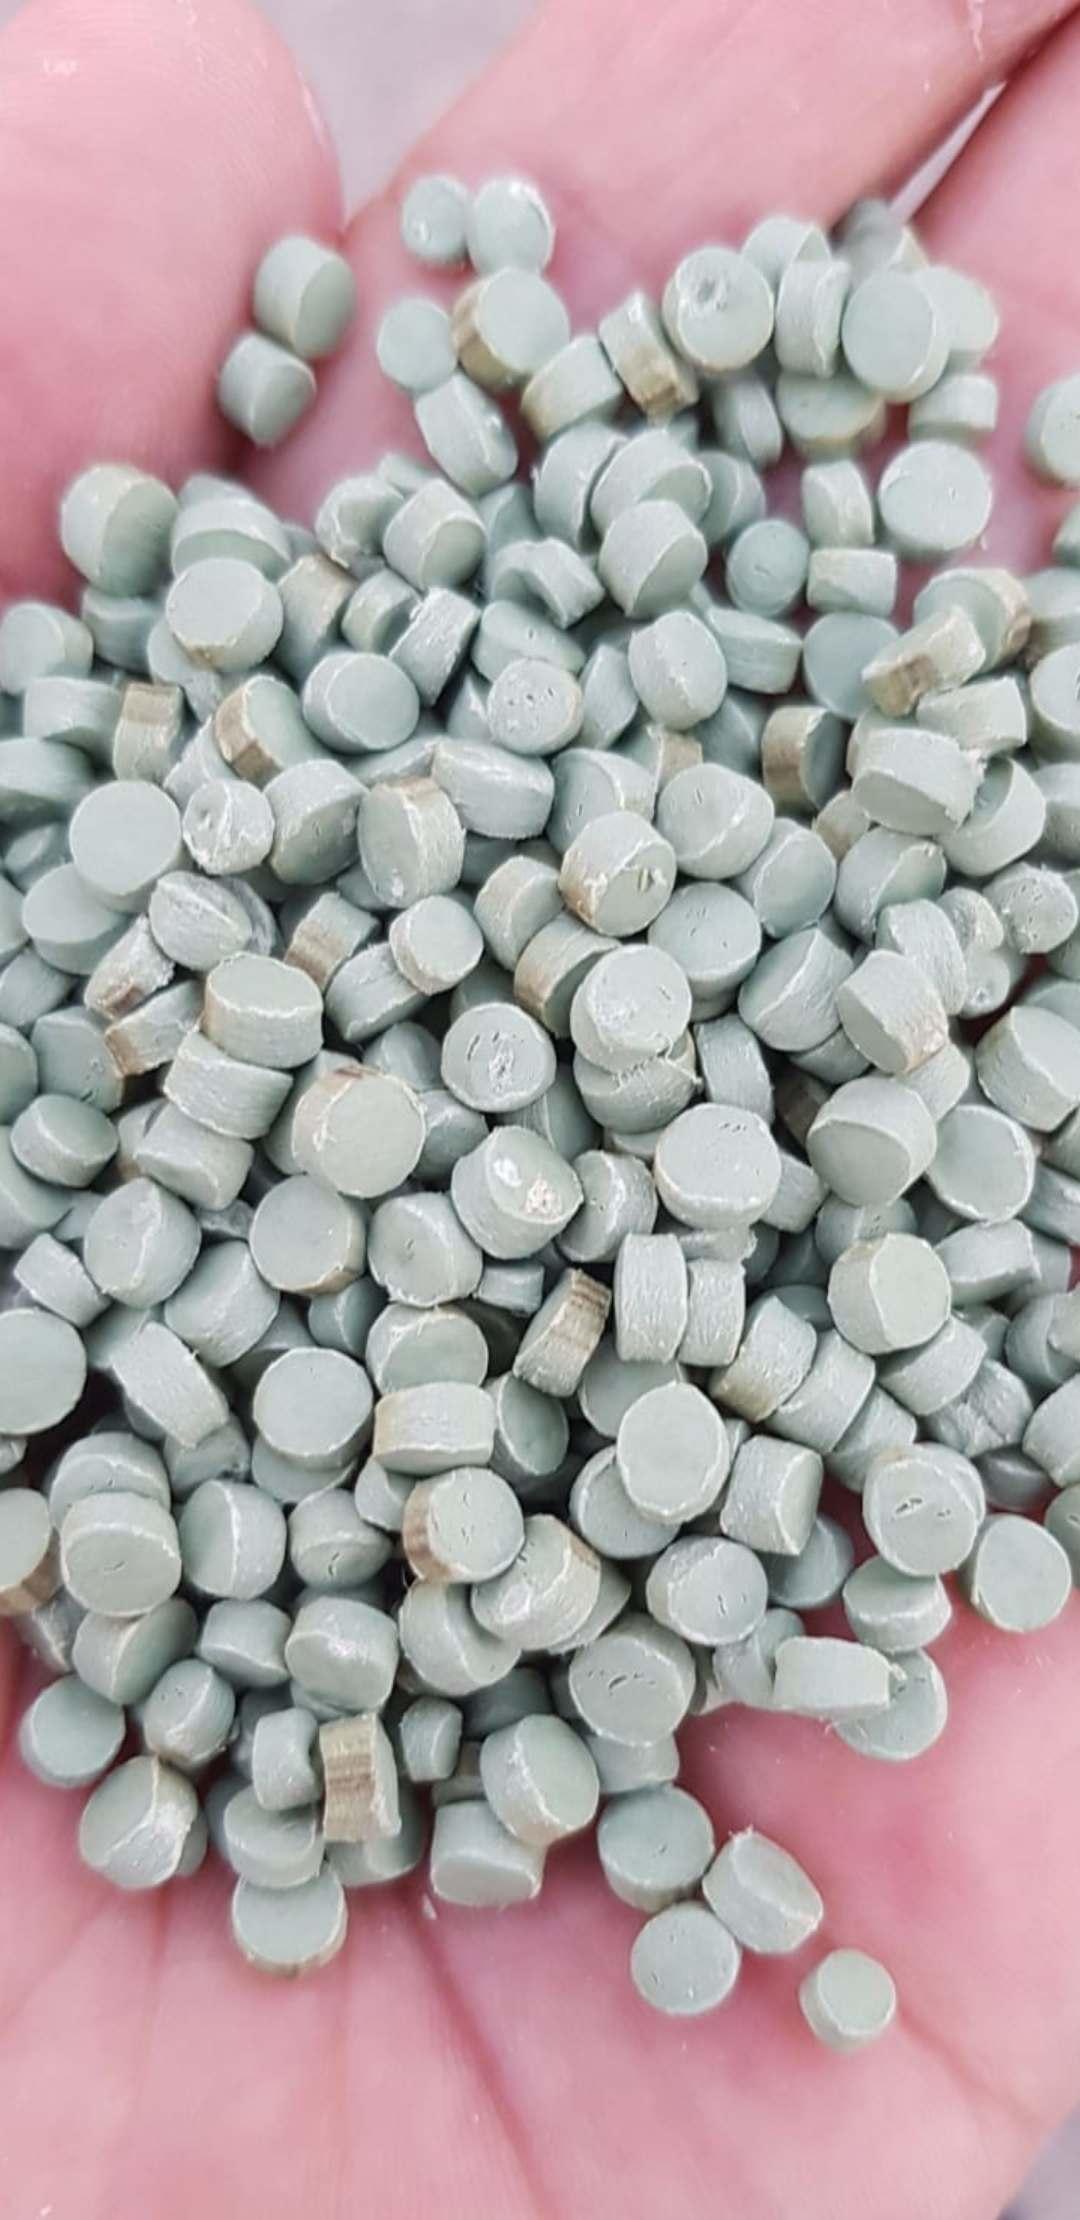 polipropylene 8002